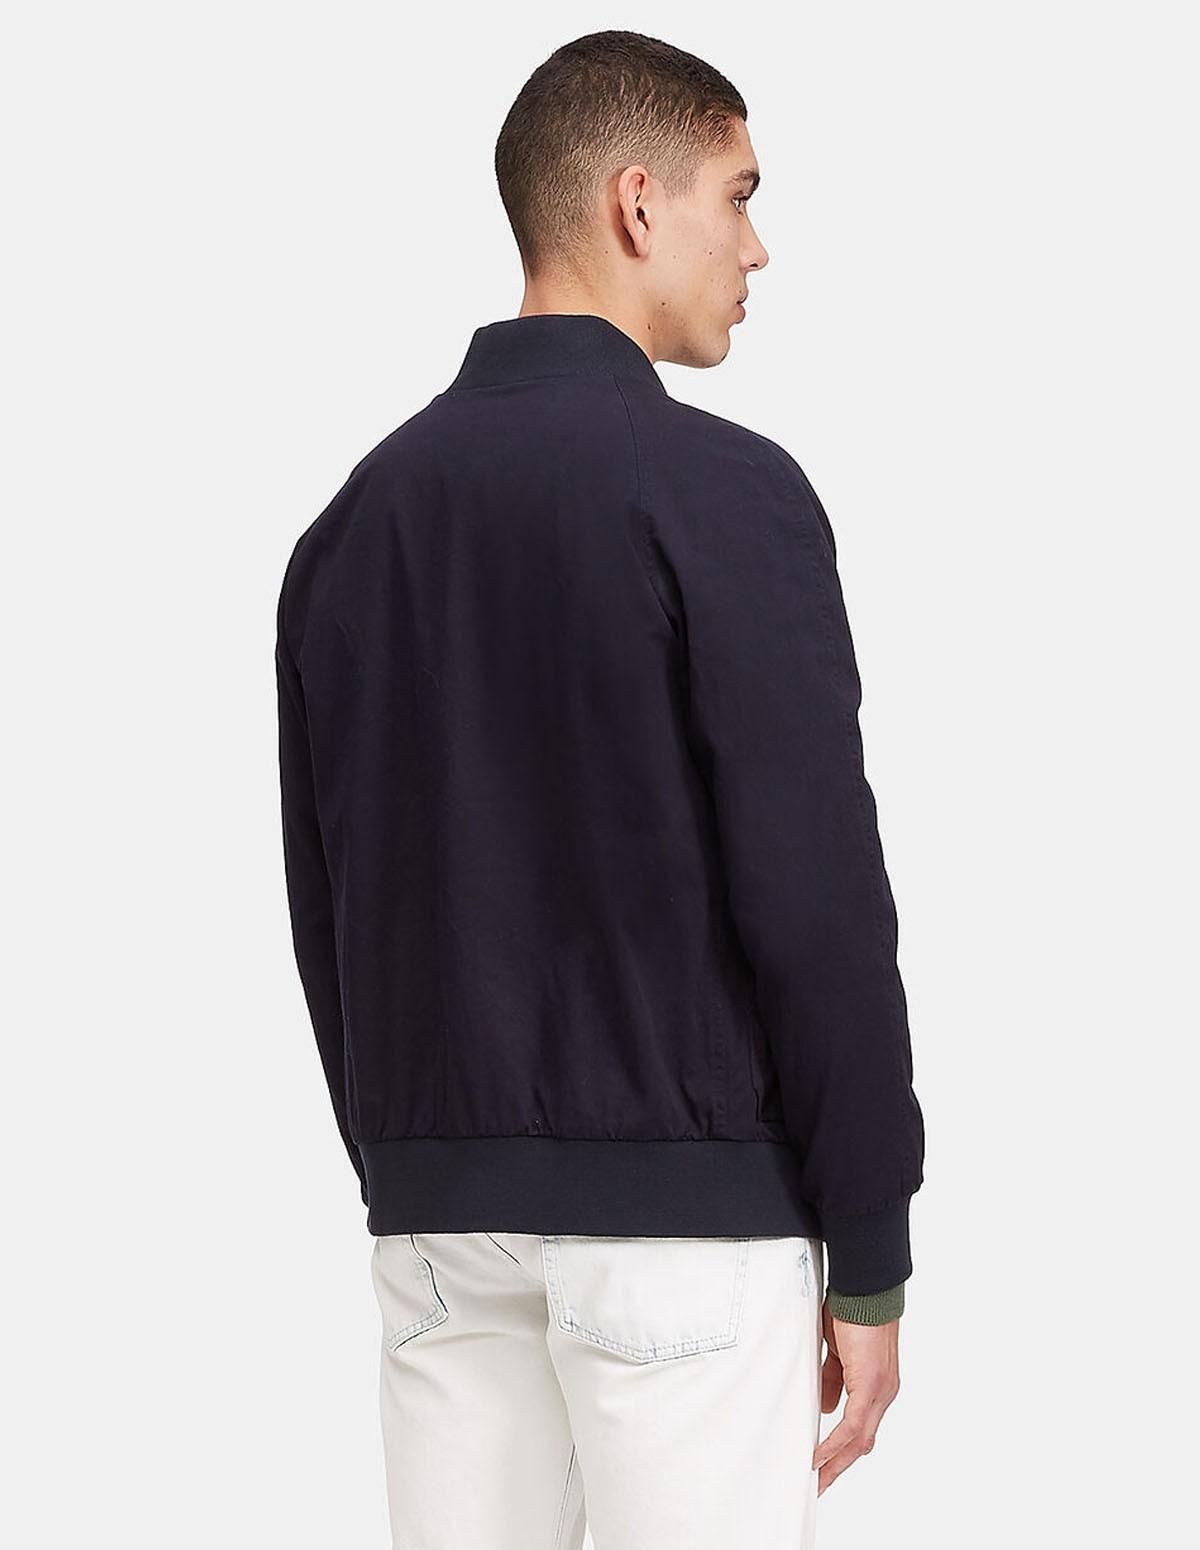 Aspesi Men's Jacket Oxford